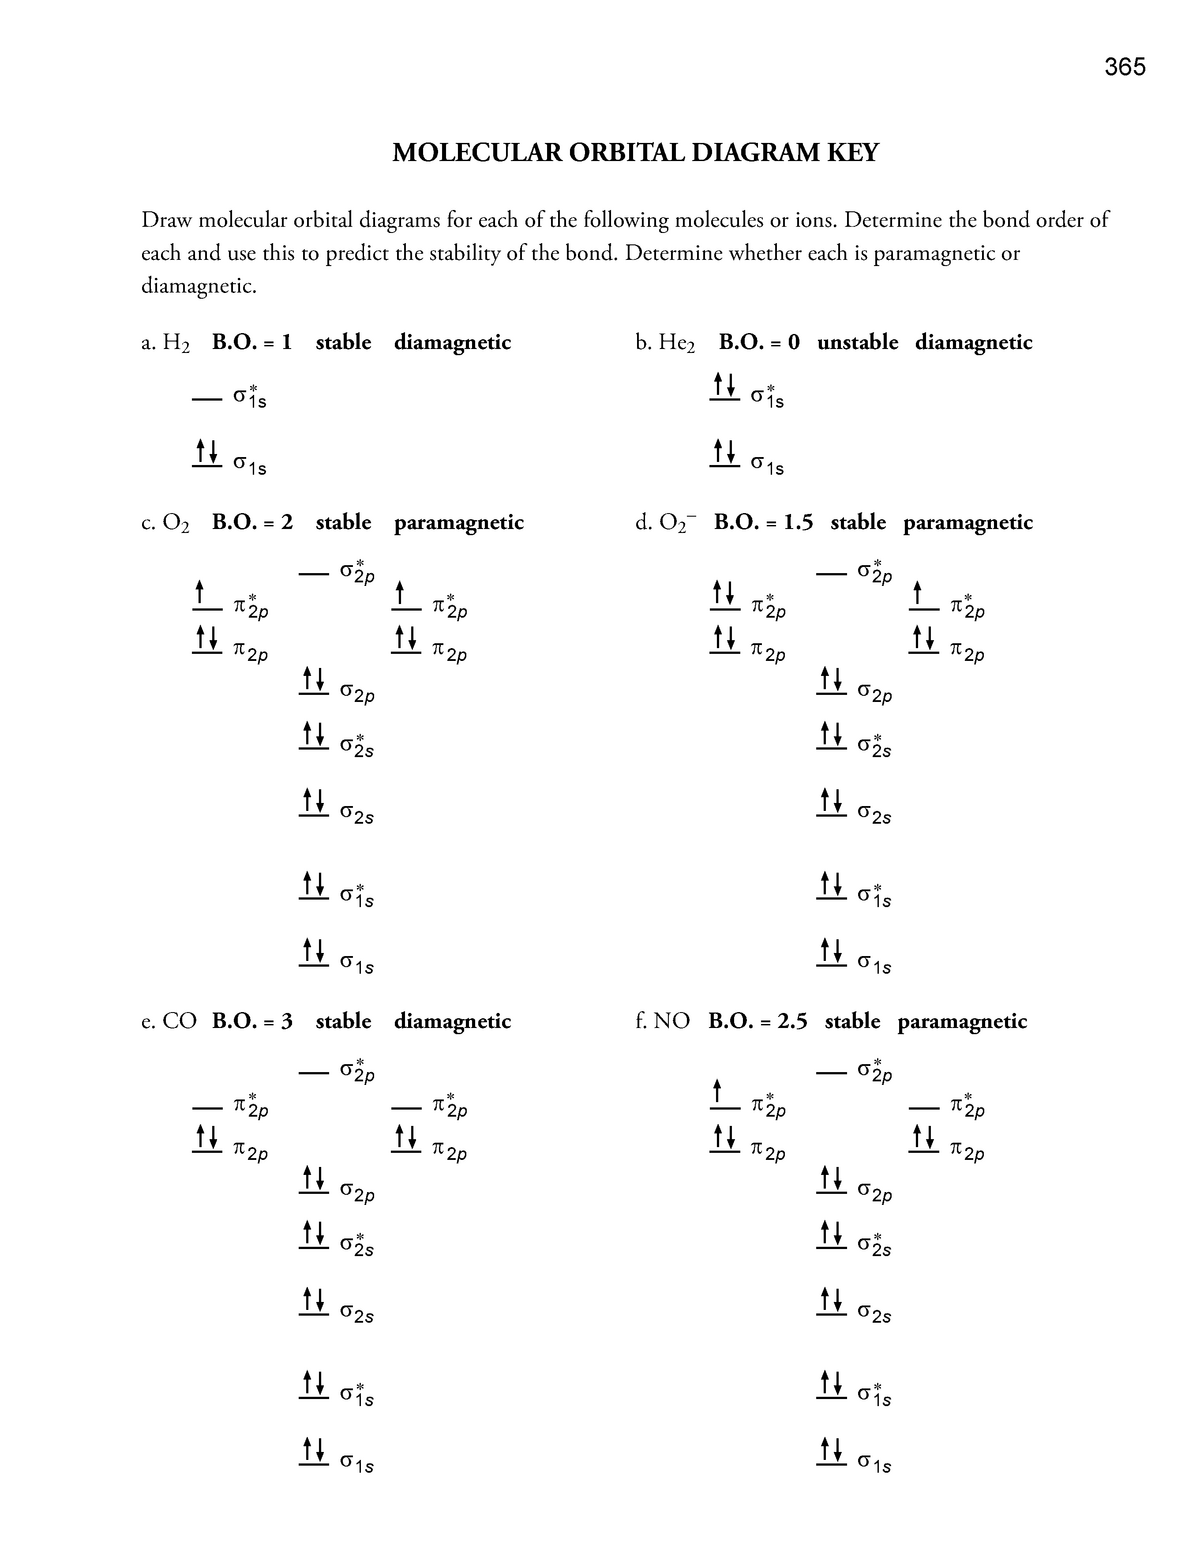 Hybridization 4 - Lecture notes 1 - CHE 300 - StuDocu